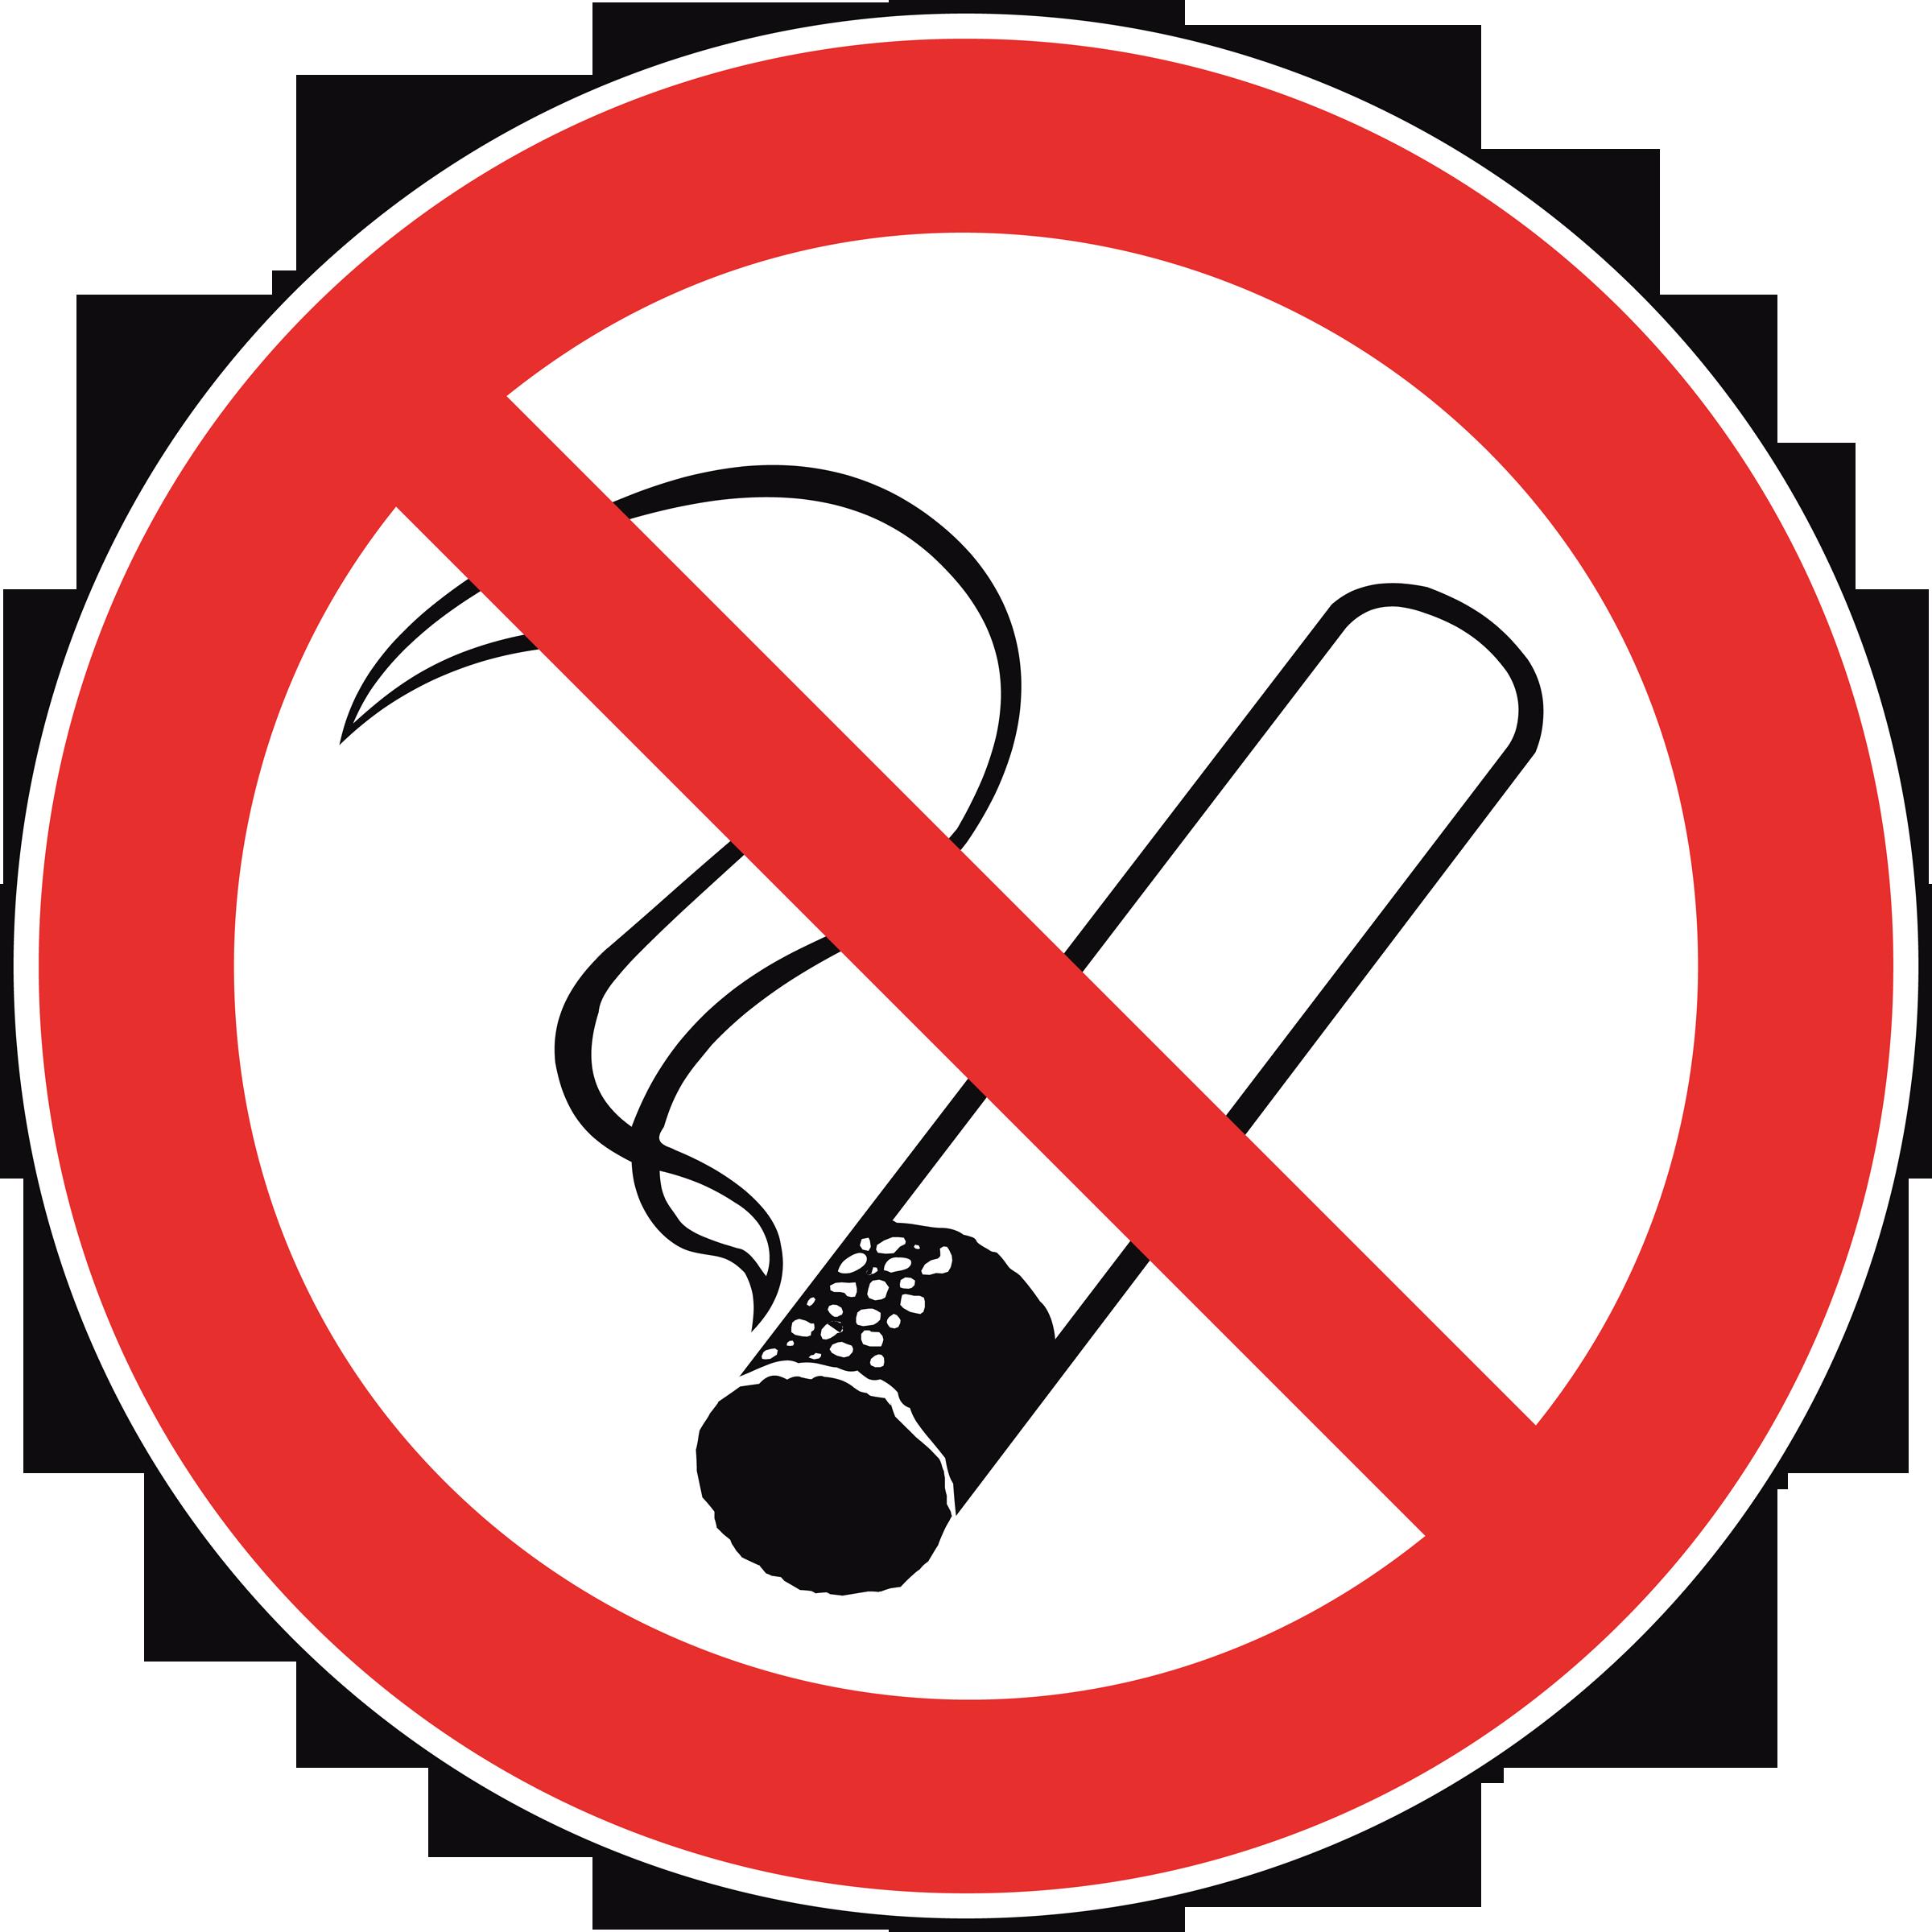 Anti tobacco clipart picture freeuse download No Tobacco PNG Transparent No Tobacco.PNG Images. | PlusPNG picture freeuse download